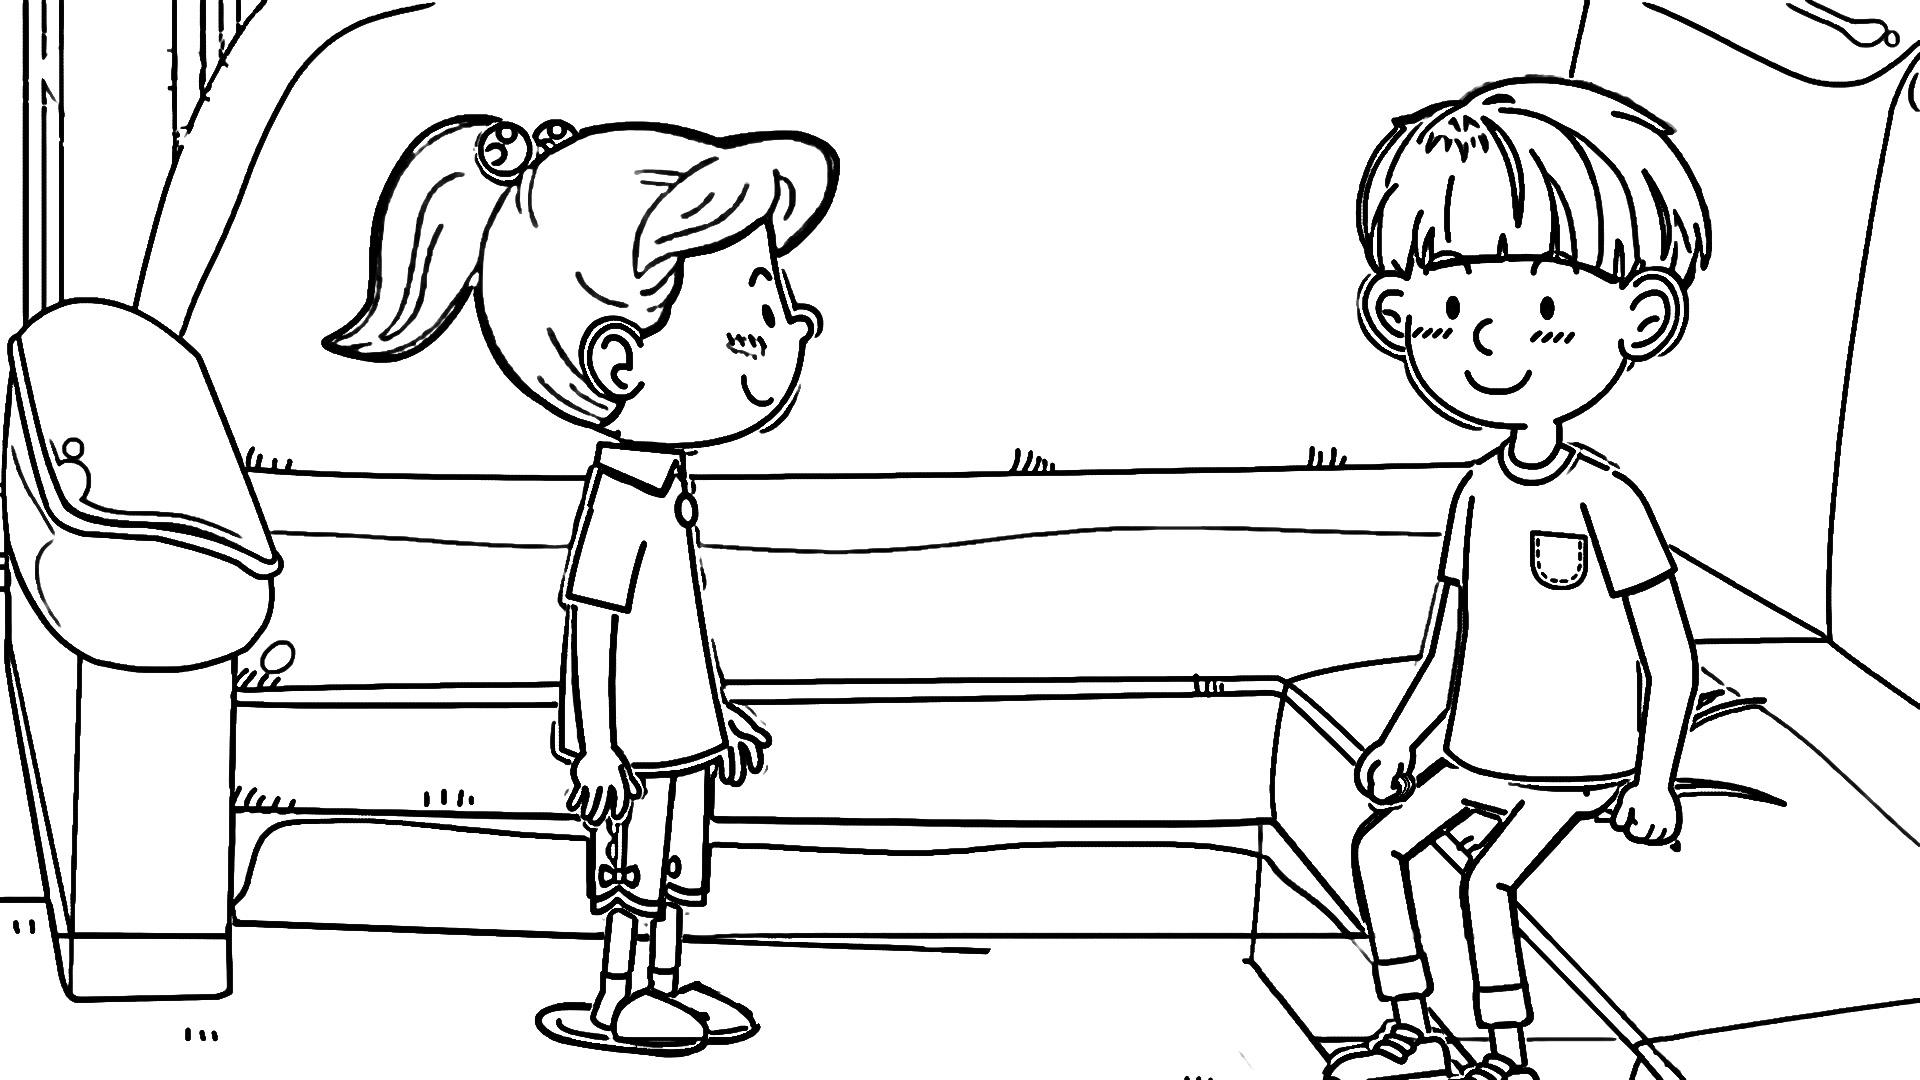 Speaking Cartoon Kids Coloring Page 38